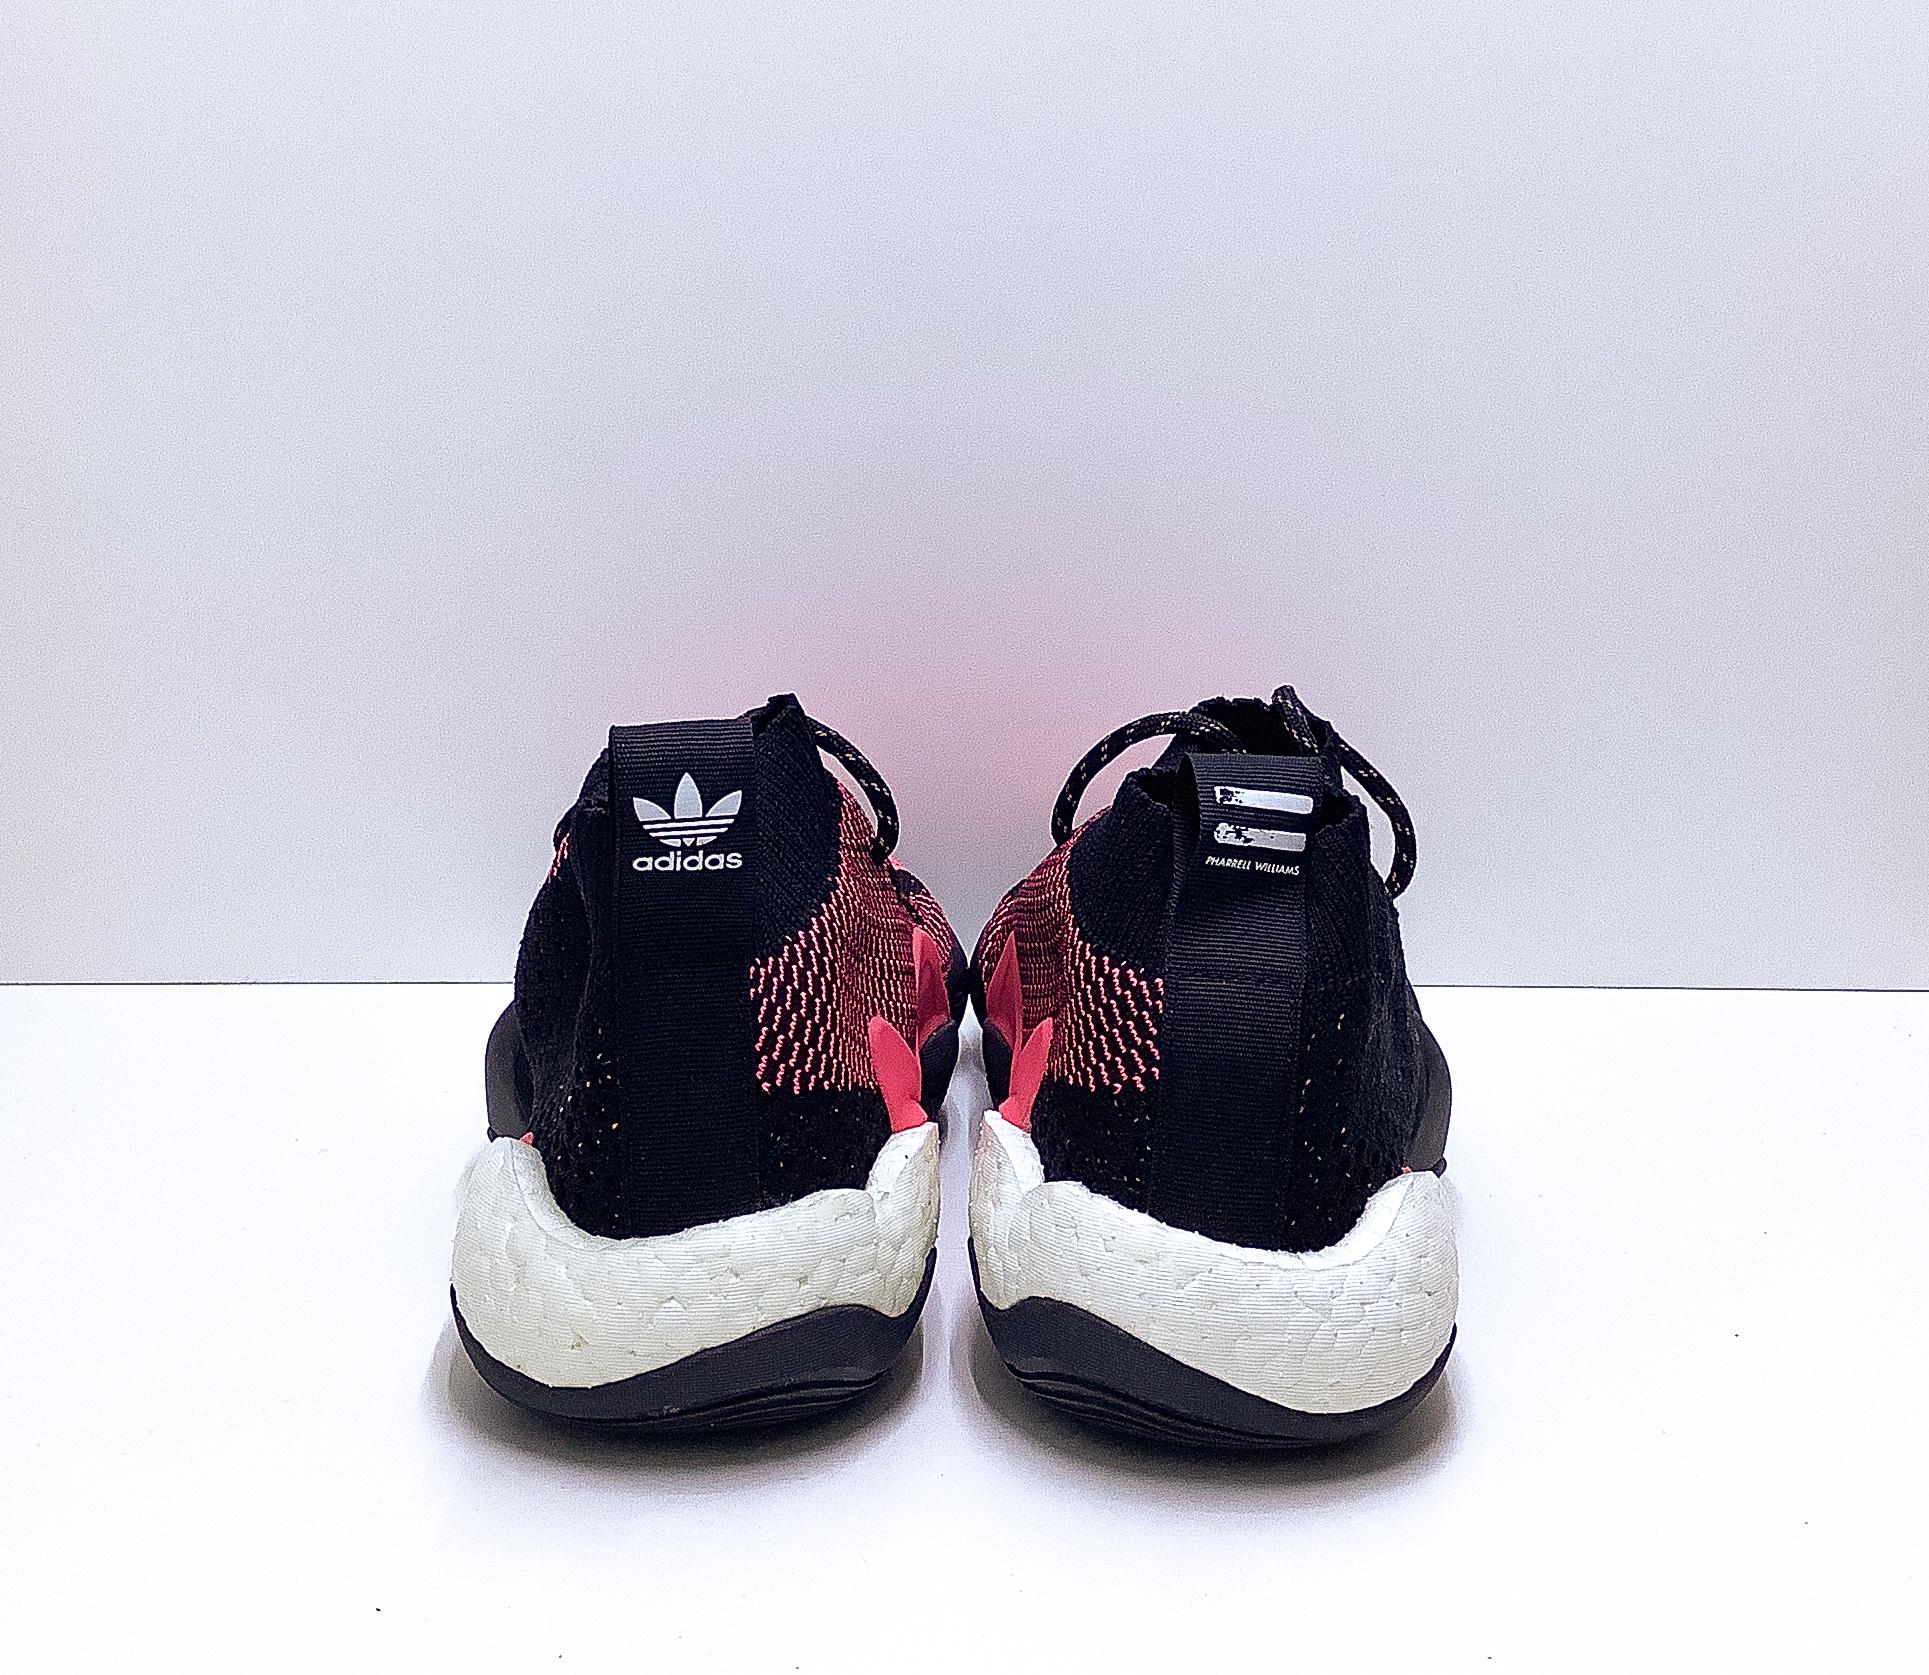 Adidas Crazy BYW LVL X Pharrell Ambition Black